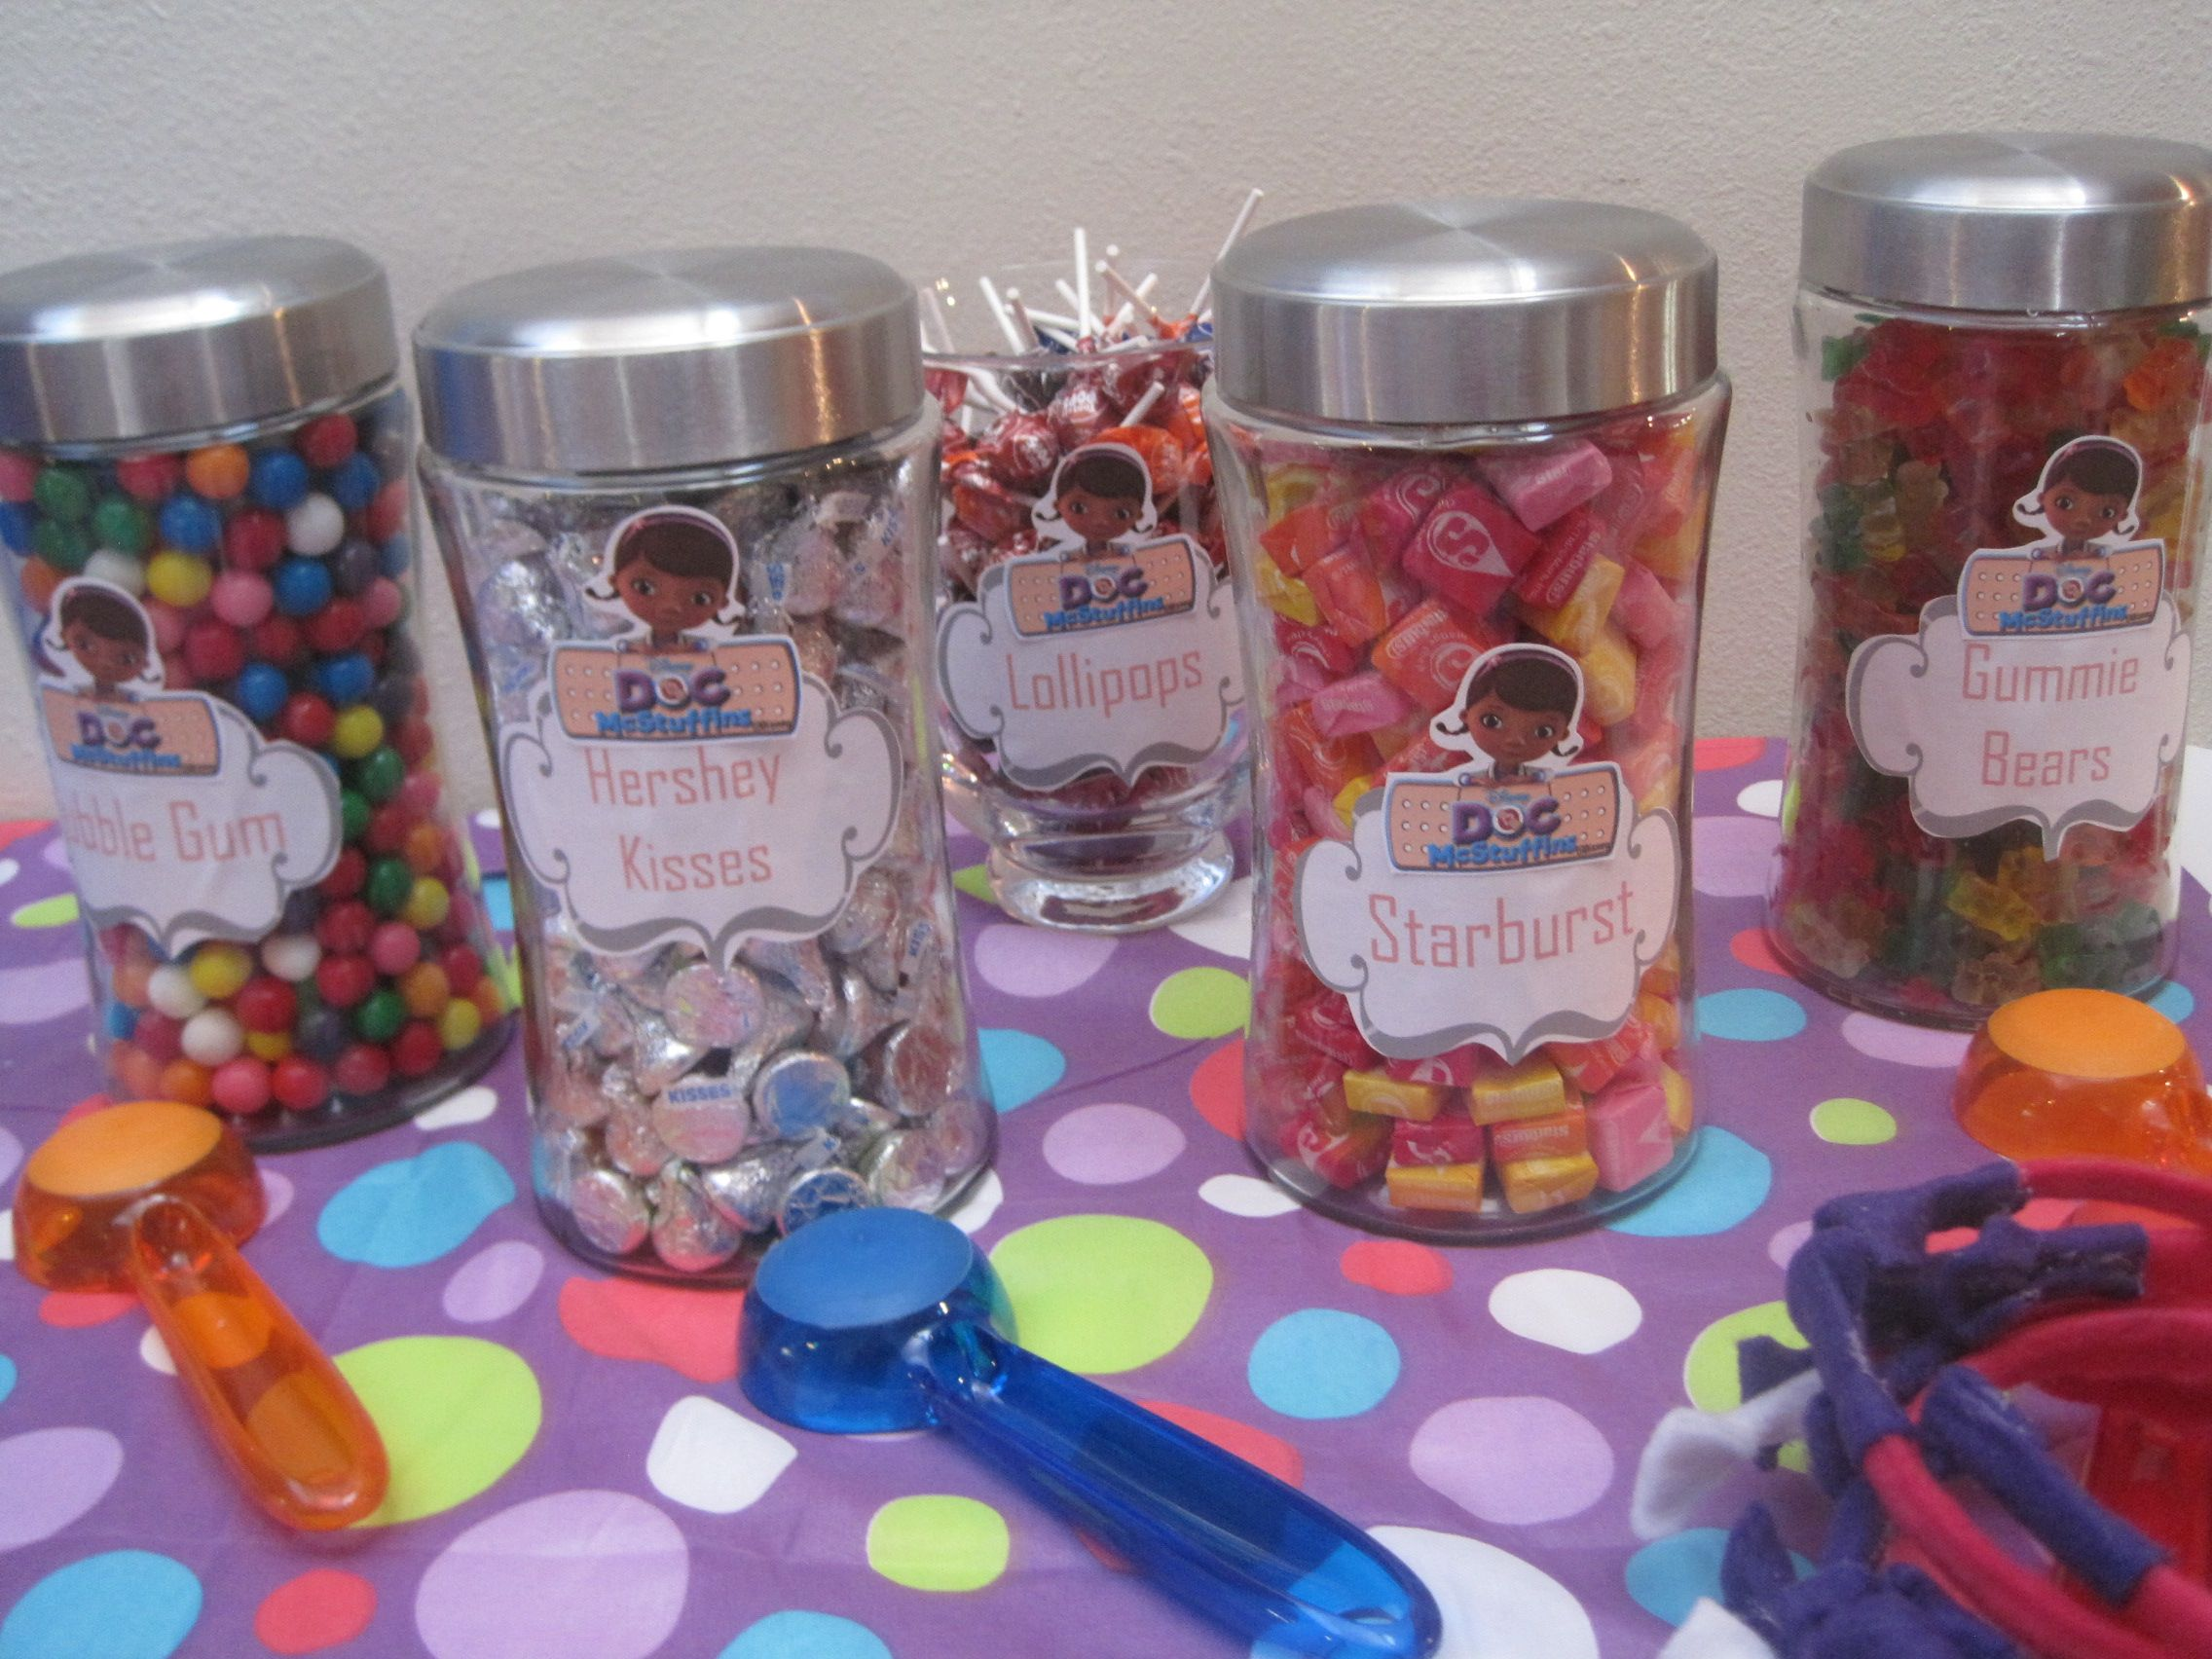 Doc mcstuffins bandages doc mcstuffins party ideas on pinterest doc - Doc Mcstuffins Candy Buffet With Closed Jars Just Like At A Dr Office